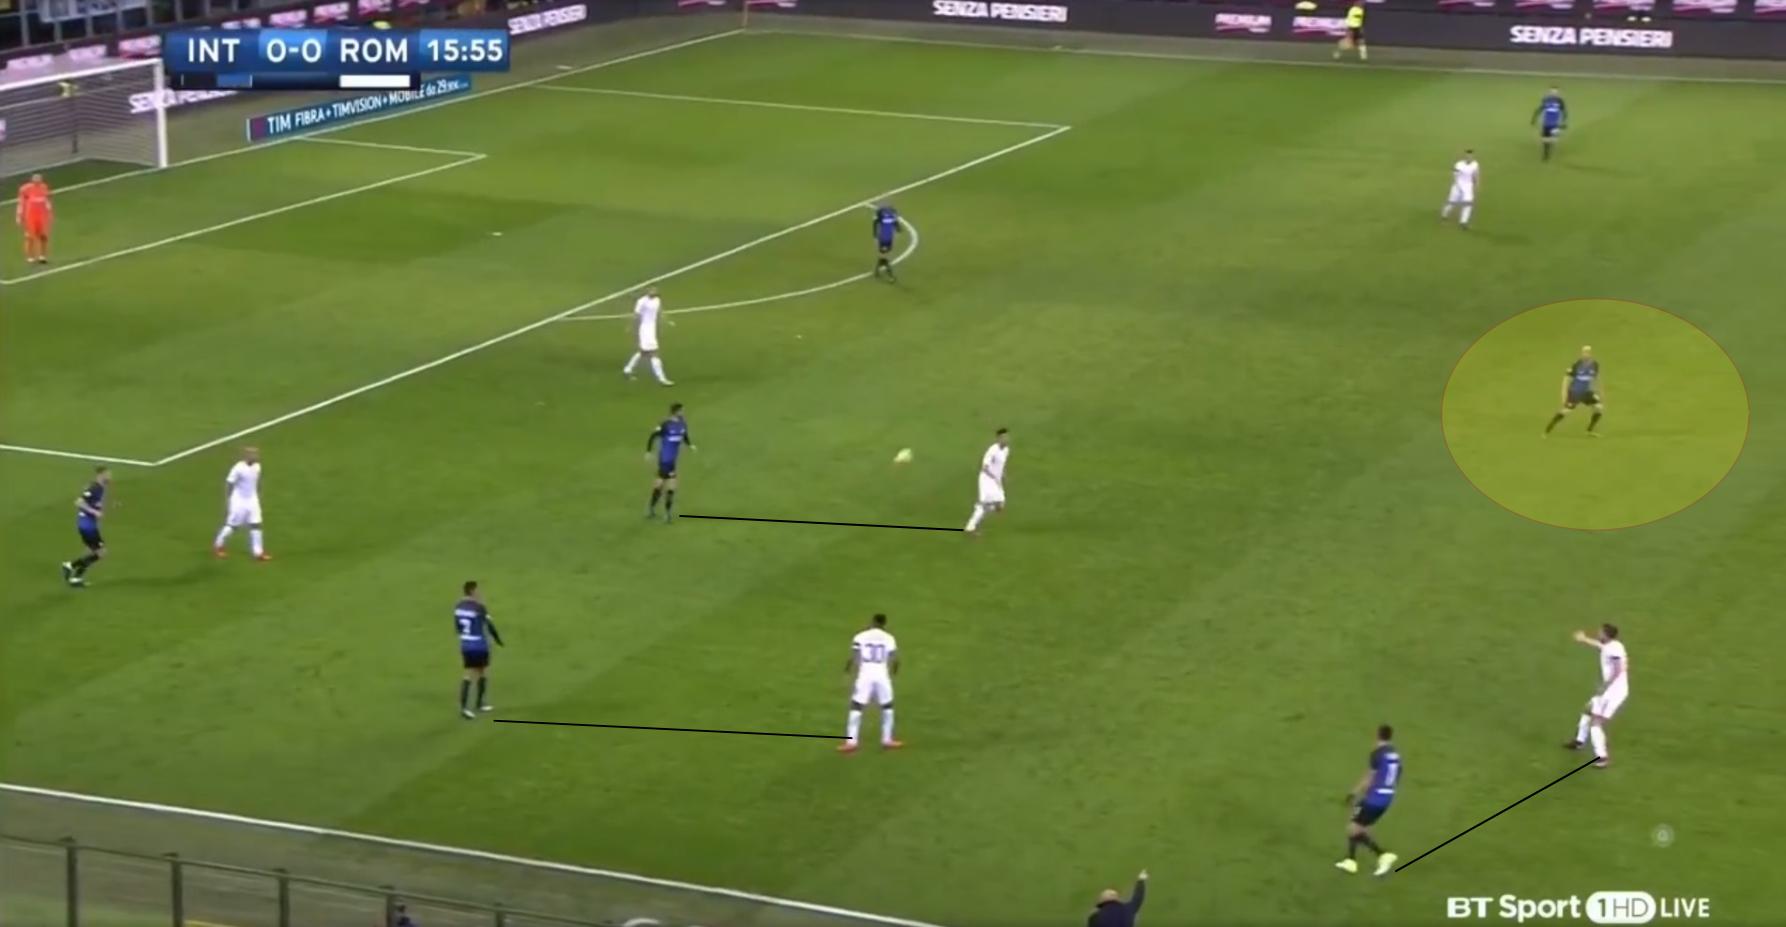 Inter Roma 6.